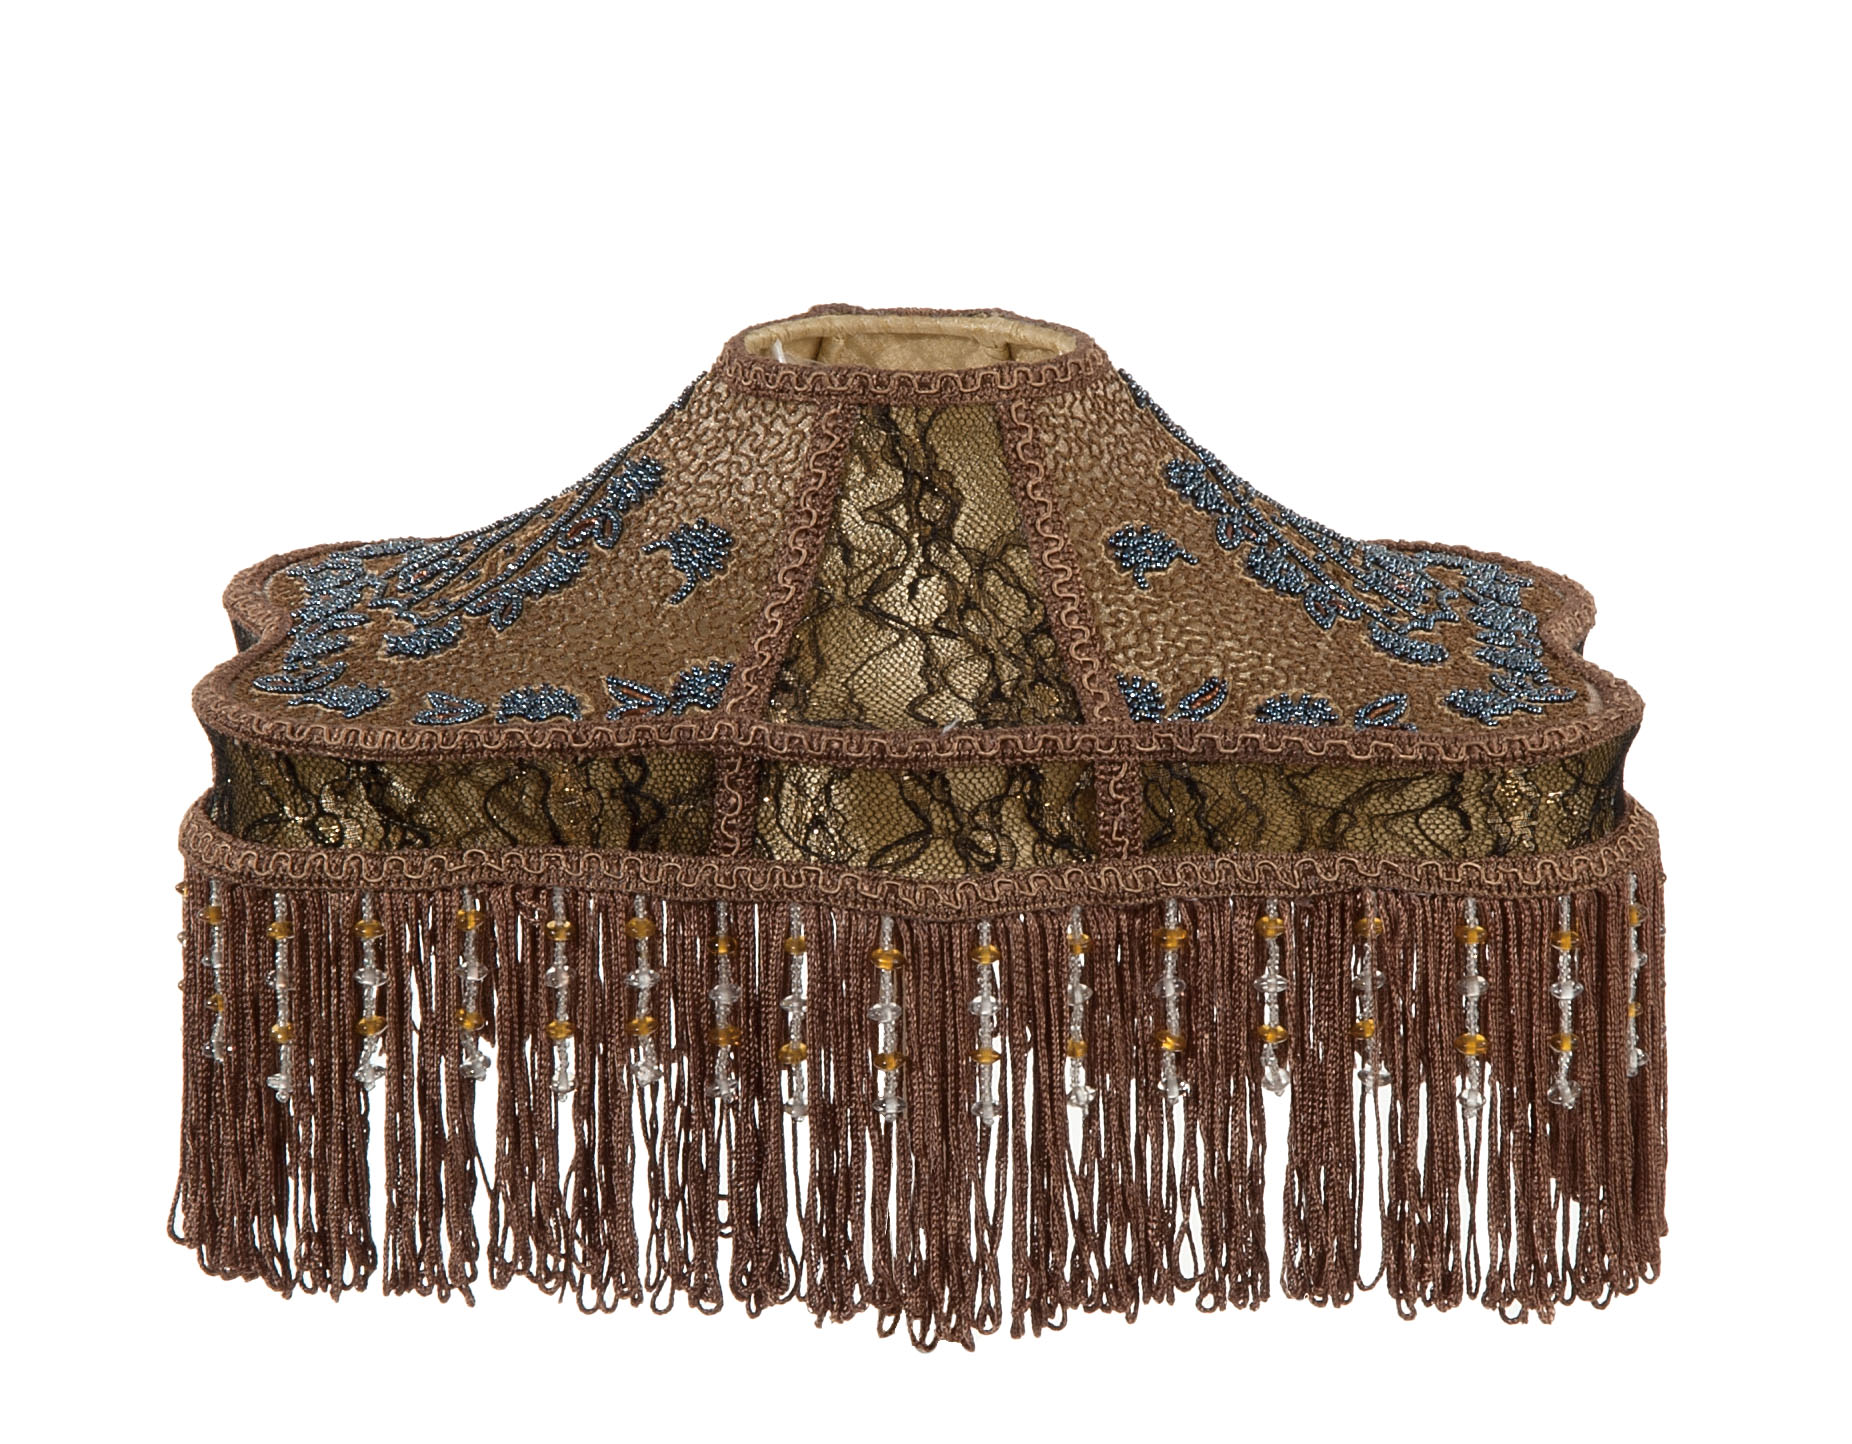 Beadwork Amp Stipple Embroidery Table Shade 06963s B Amp P